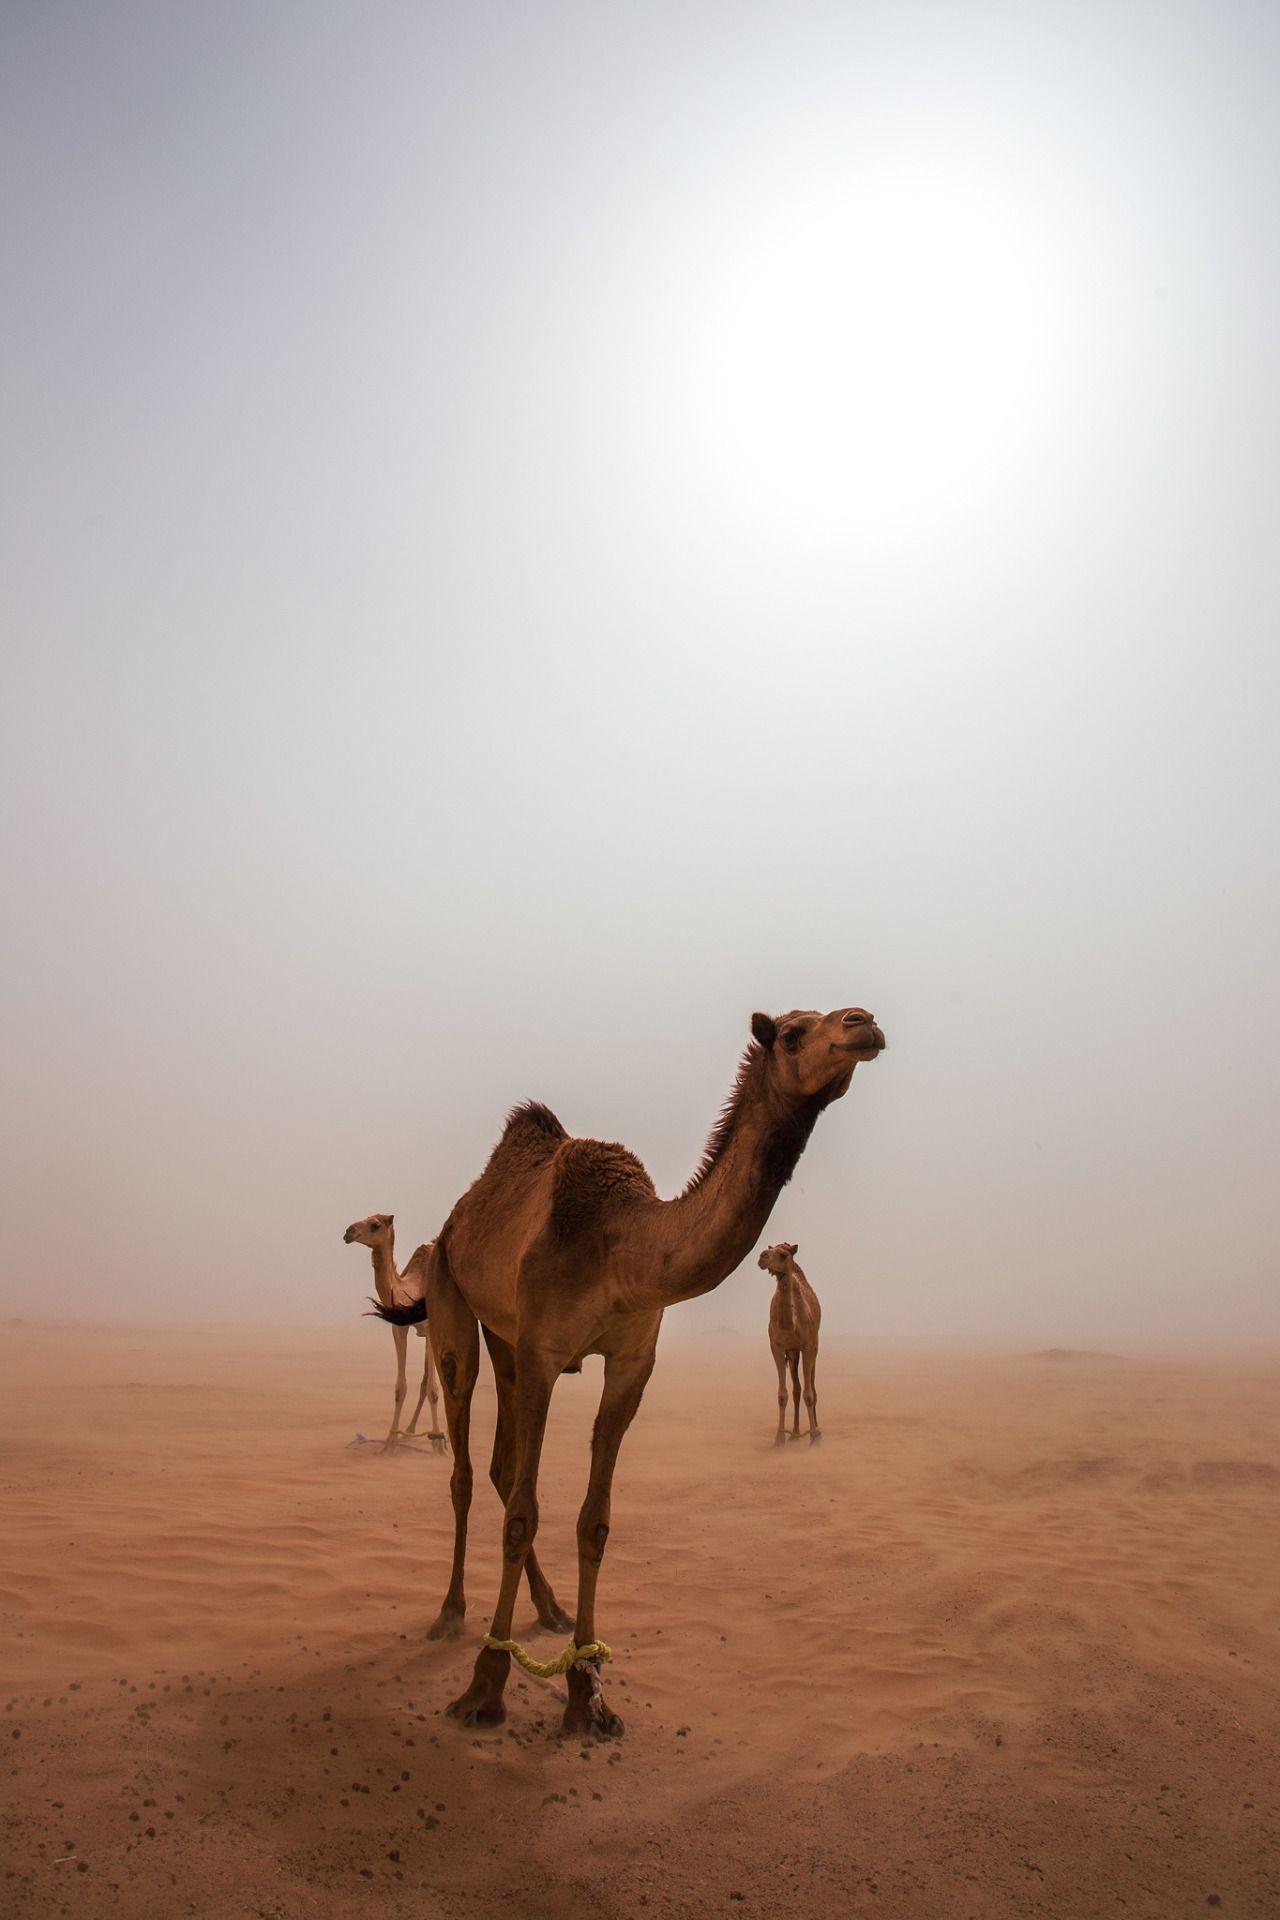 Pin by Wbb on Art tqaseem Camels, Animals beautiful